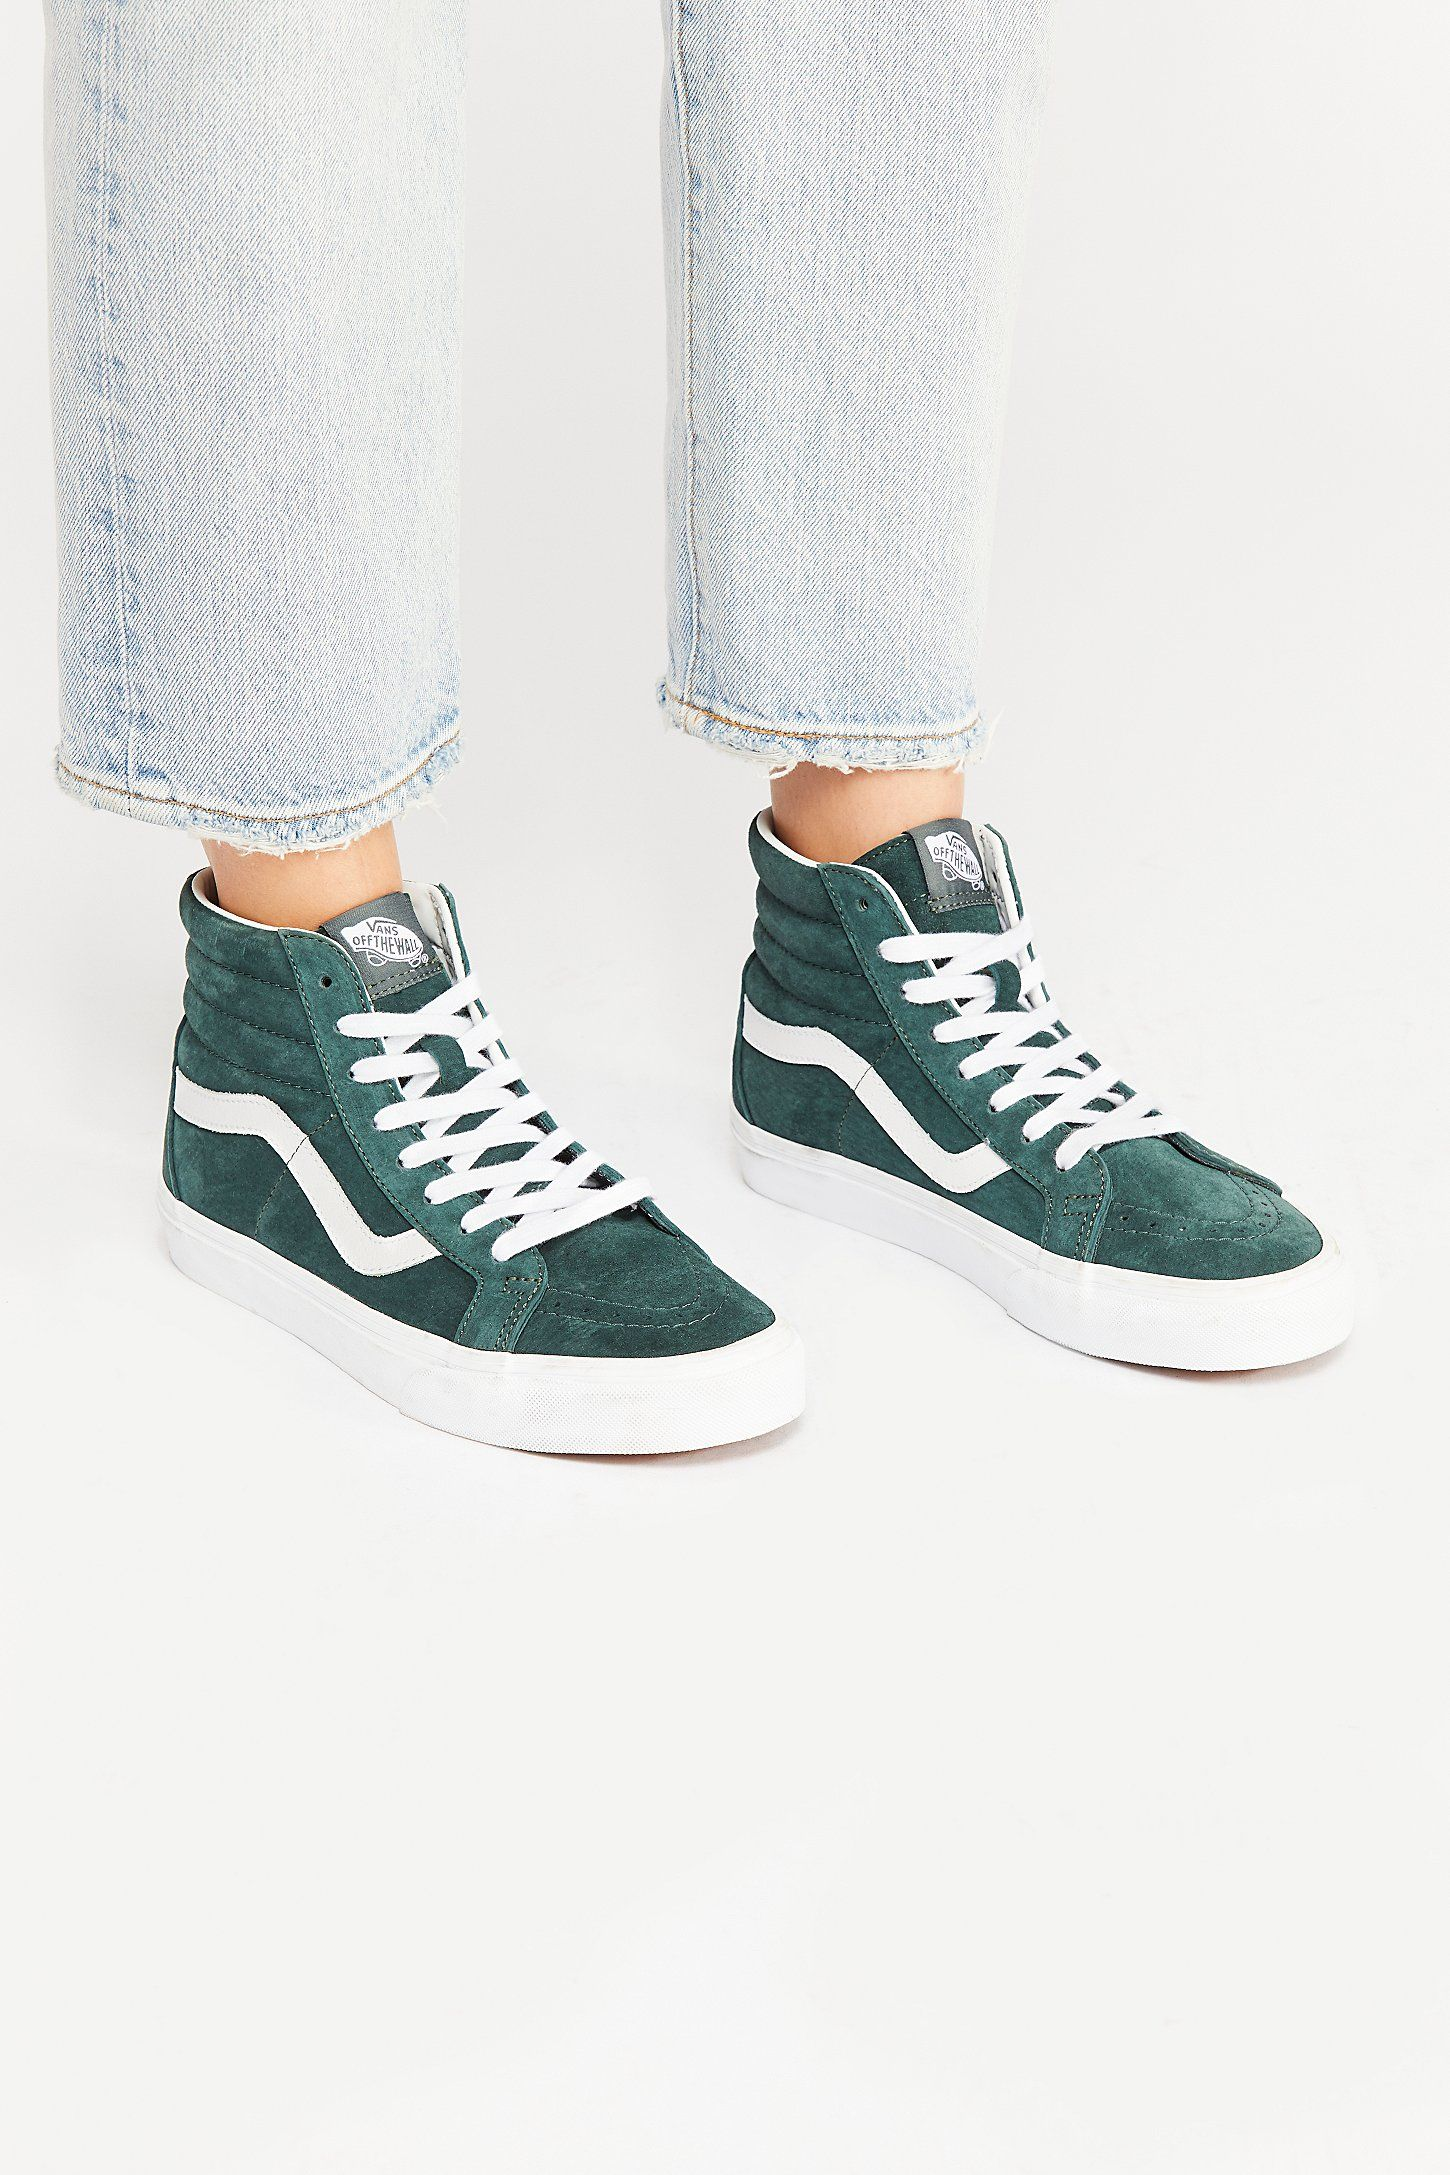 8bd8d980f588d4 Sk8-reissue Suede High-Top Sneaker in 2018